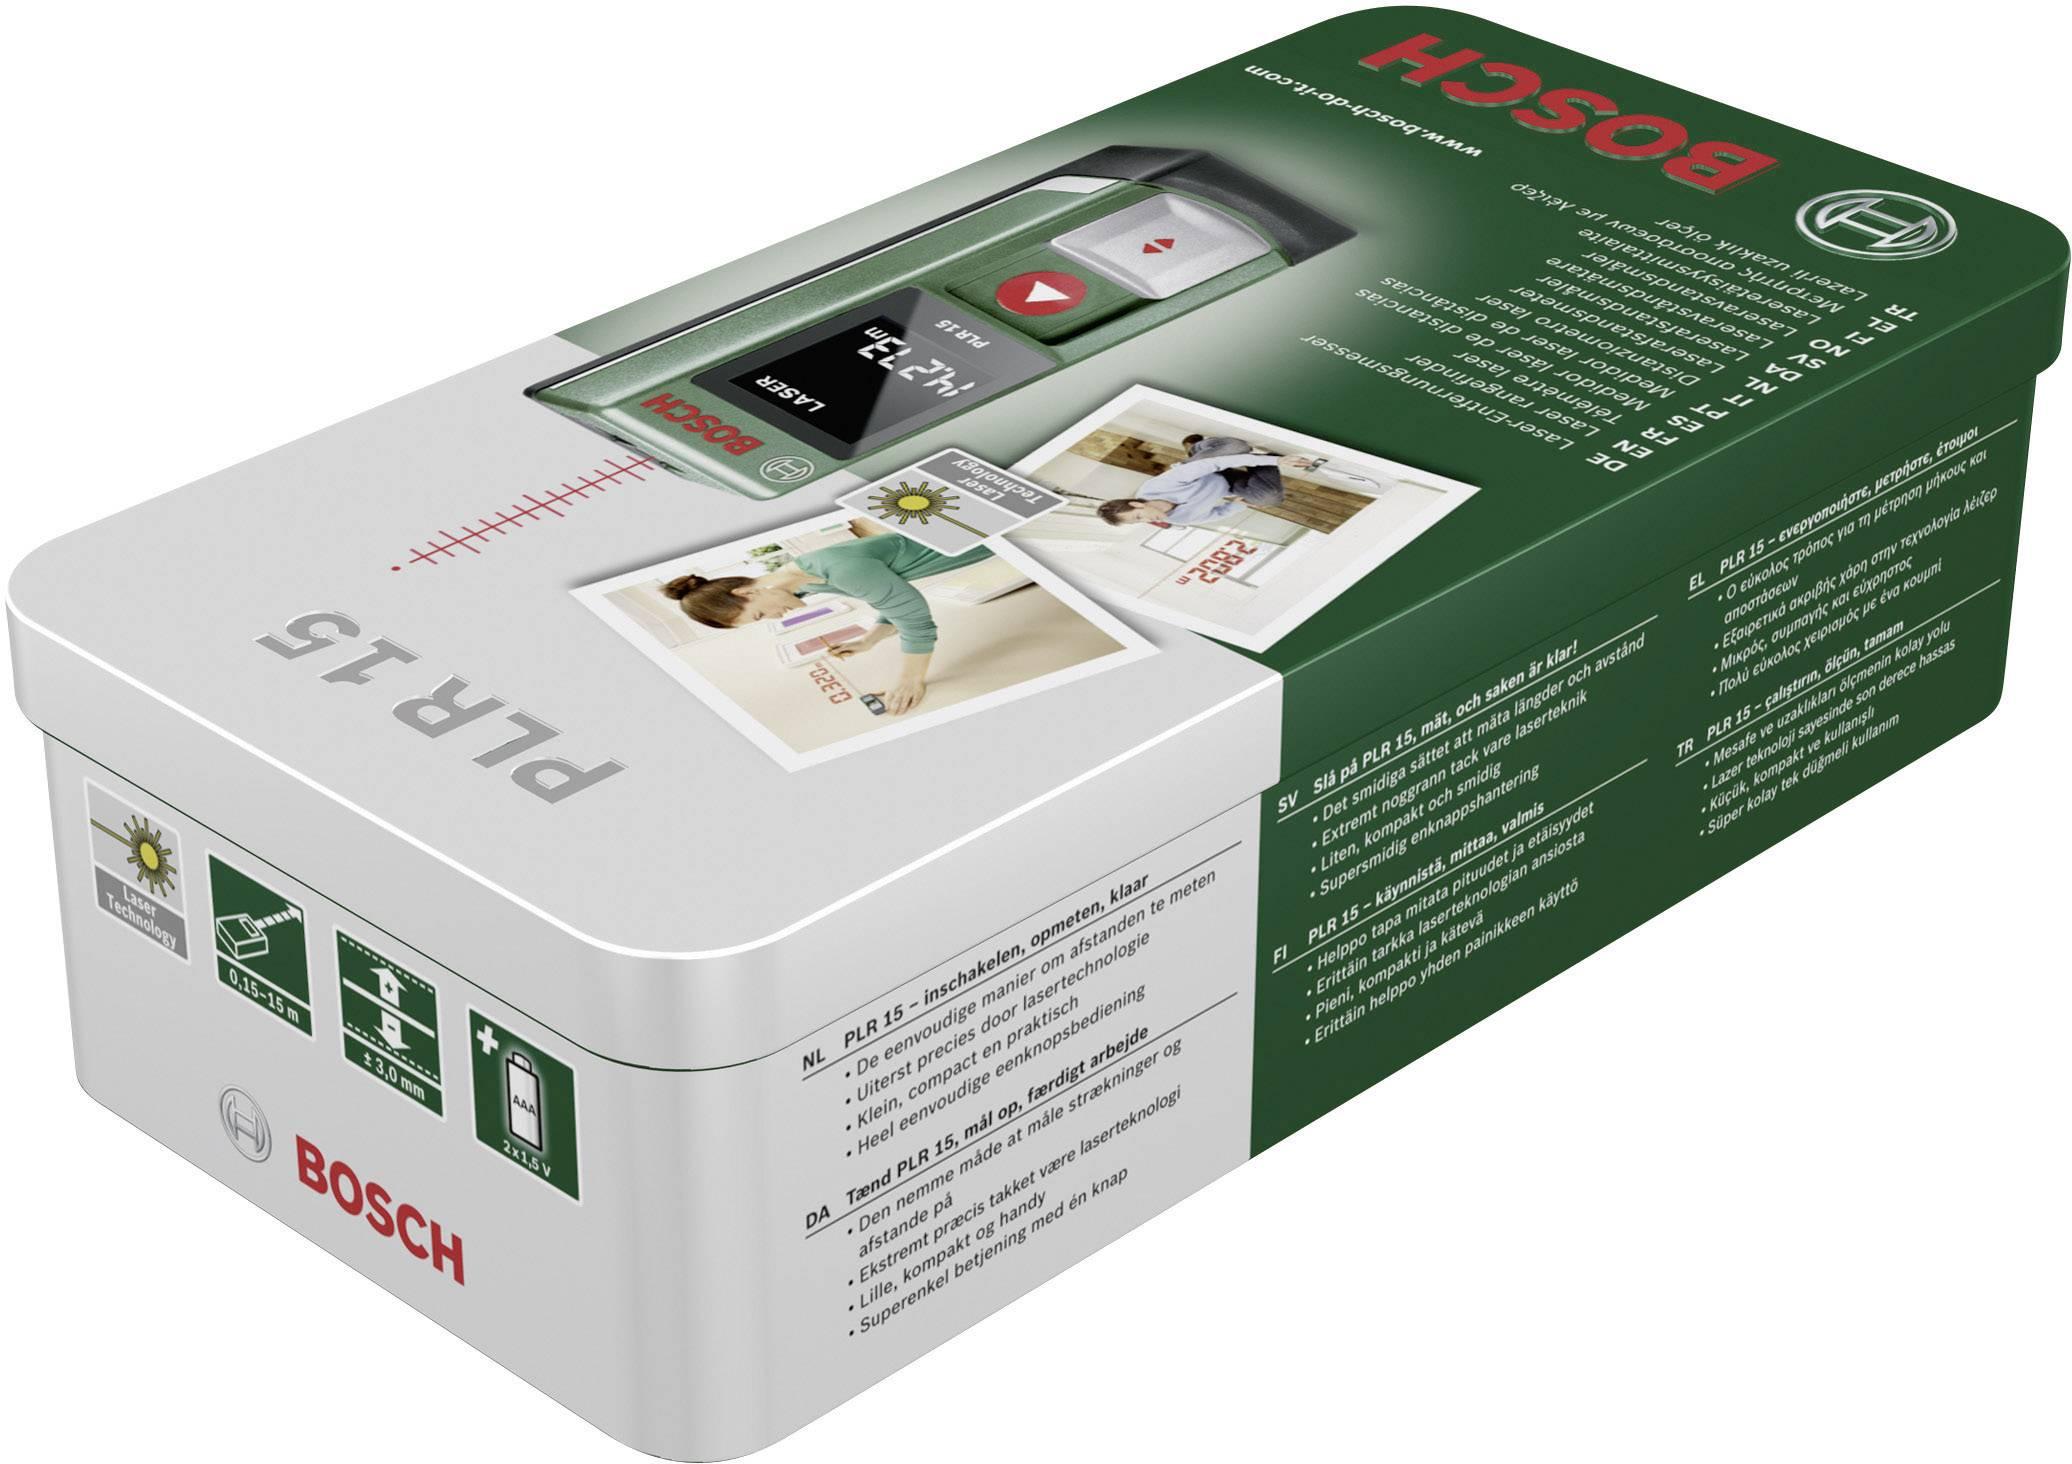 √ bosch laser entfernungsmesser plr test bosch digitaler laser